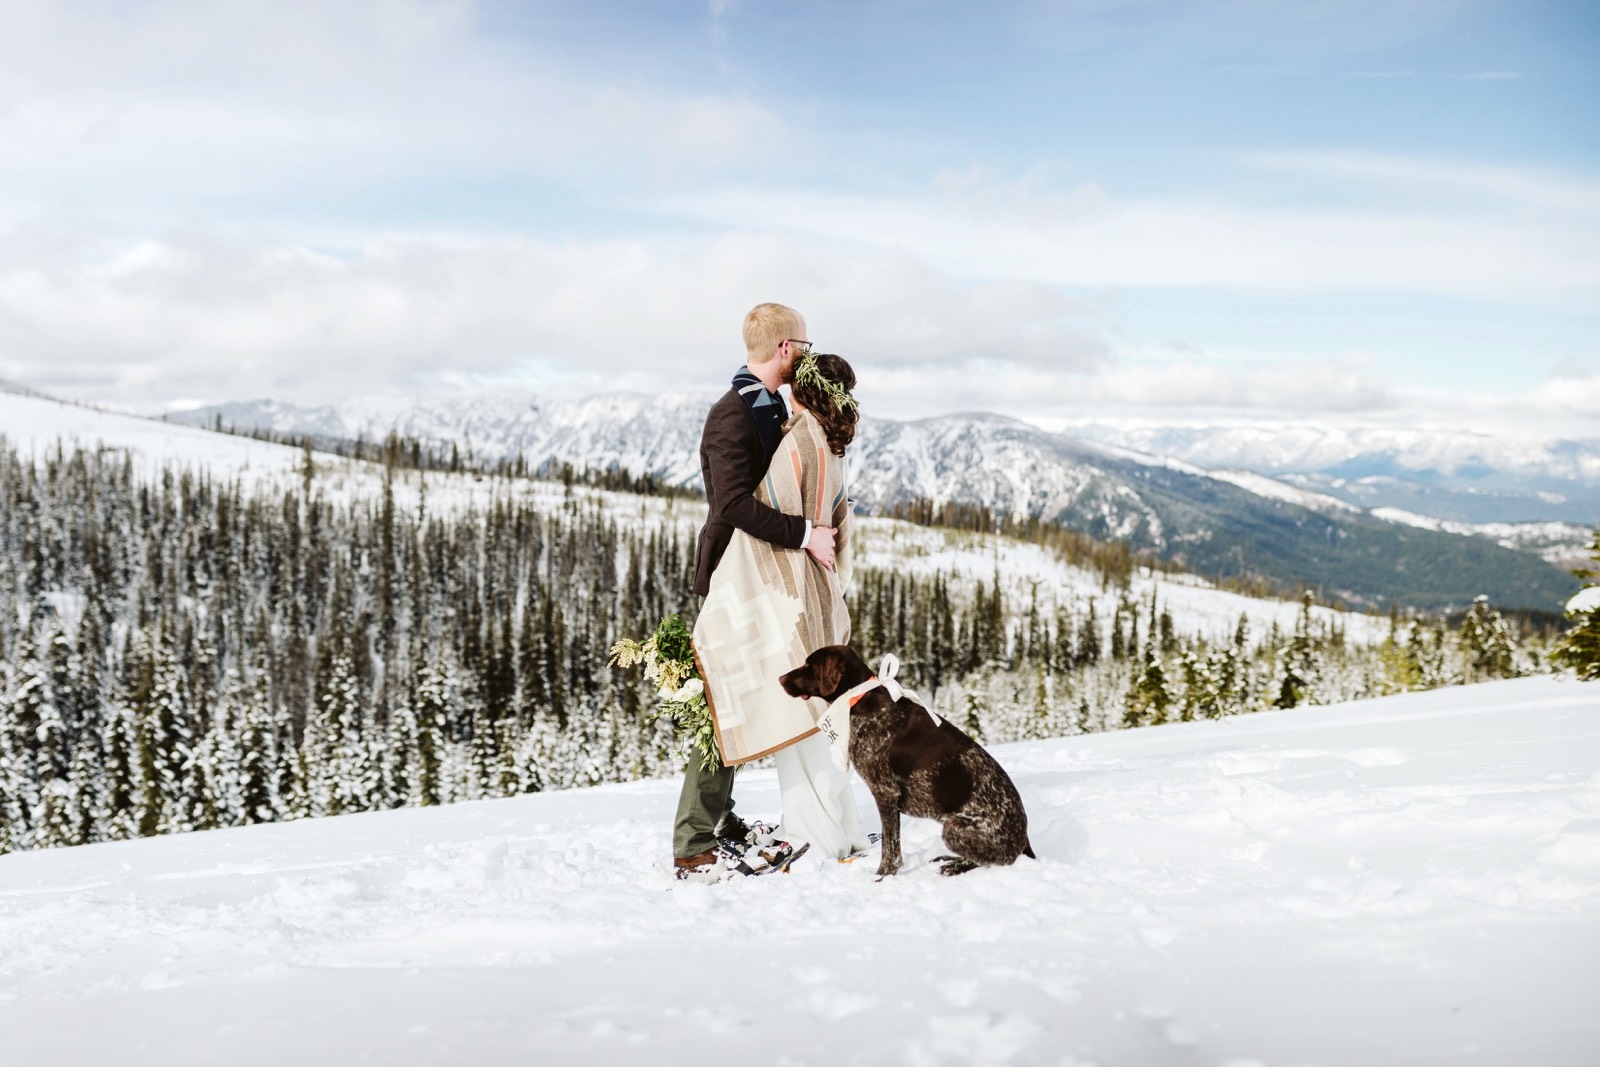 alpine-lakes-high-camp-winter-wedding-51 ALPINE LAKES HIGH CAMP WEDDING